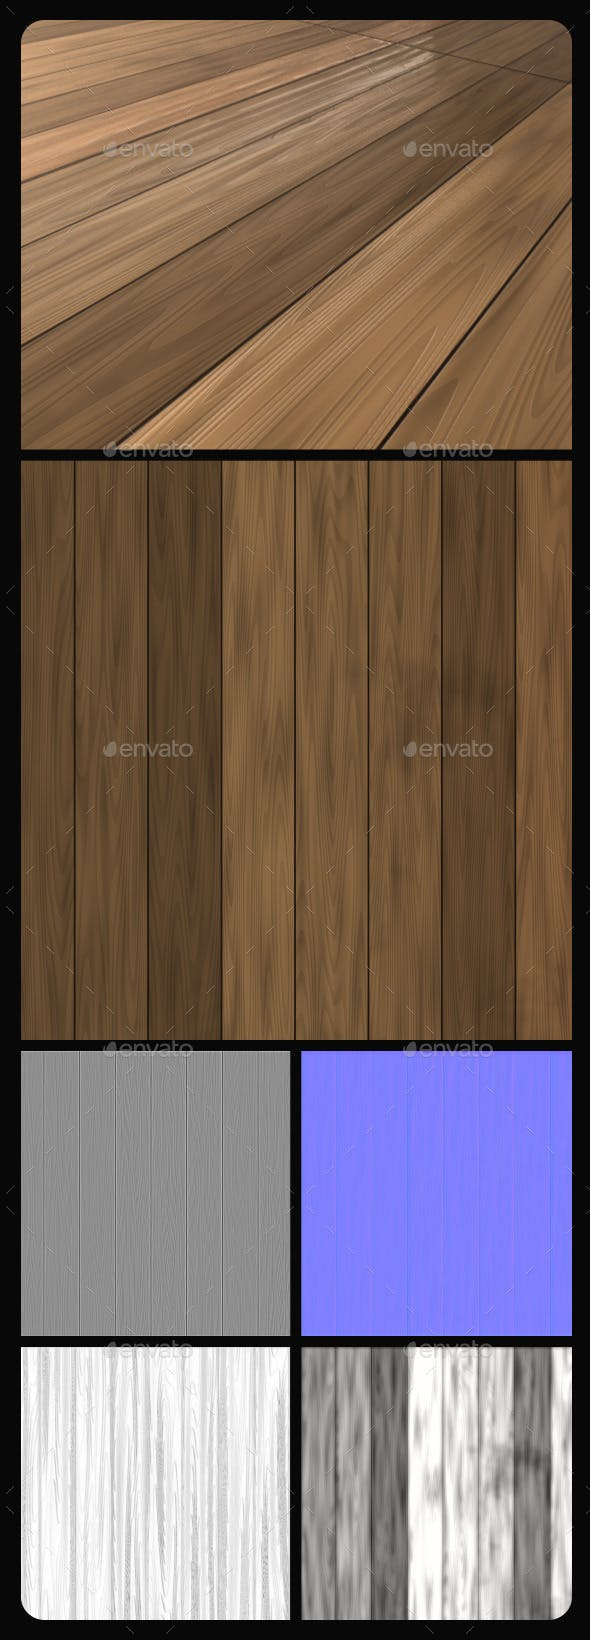 Wood Planks Tile Texture 2 - 3DOcean Item for Sale